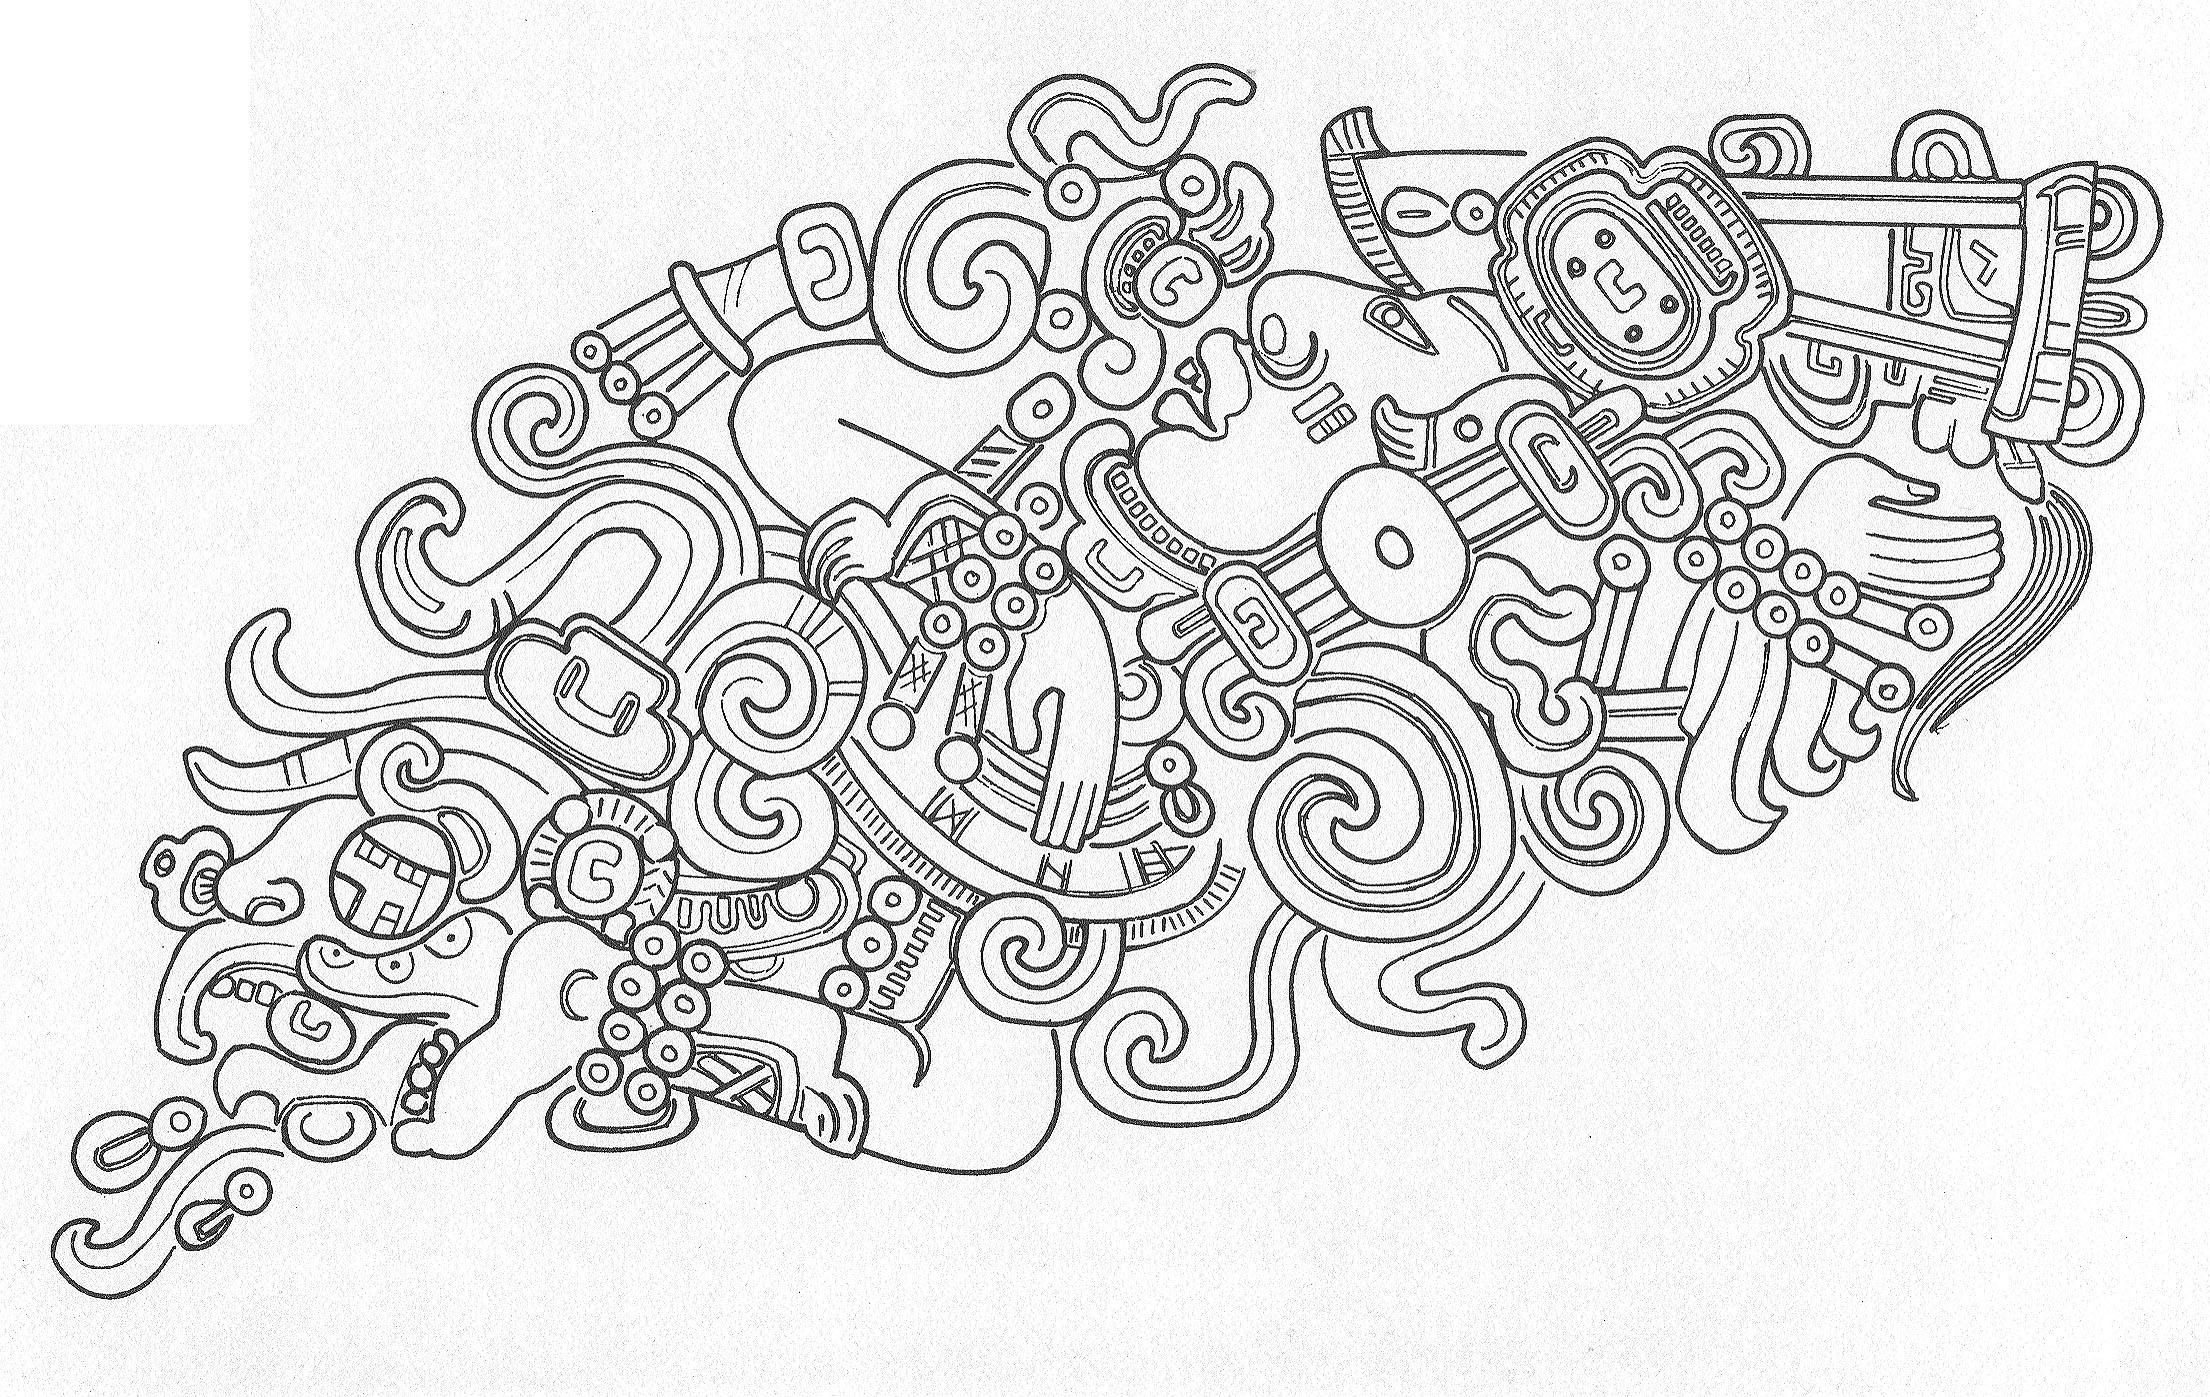 Bending Time Among The Maya Maya Decipherment